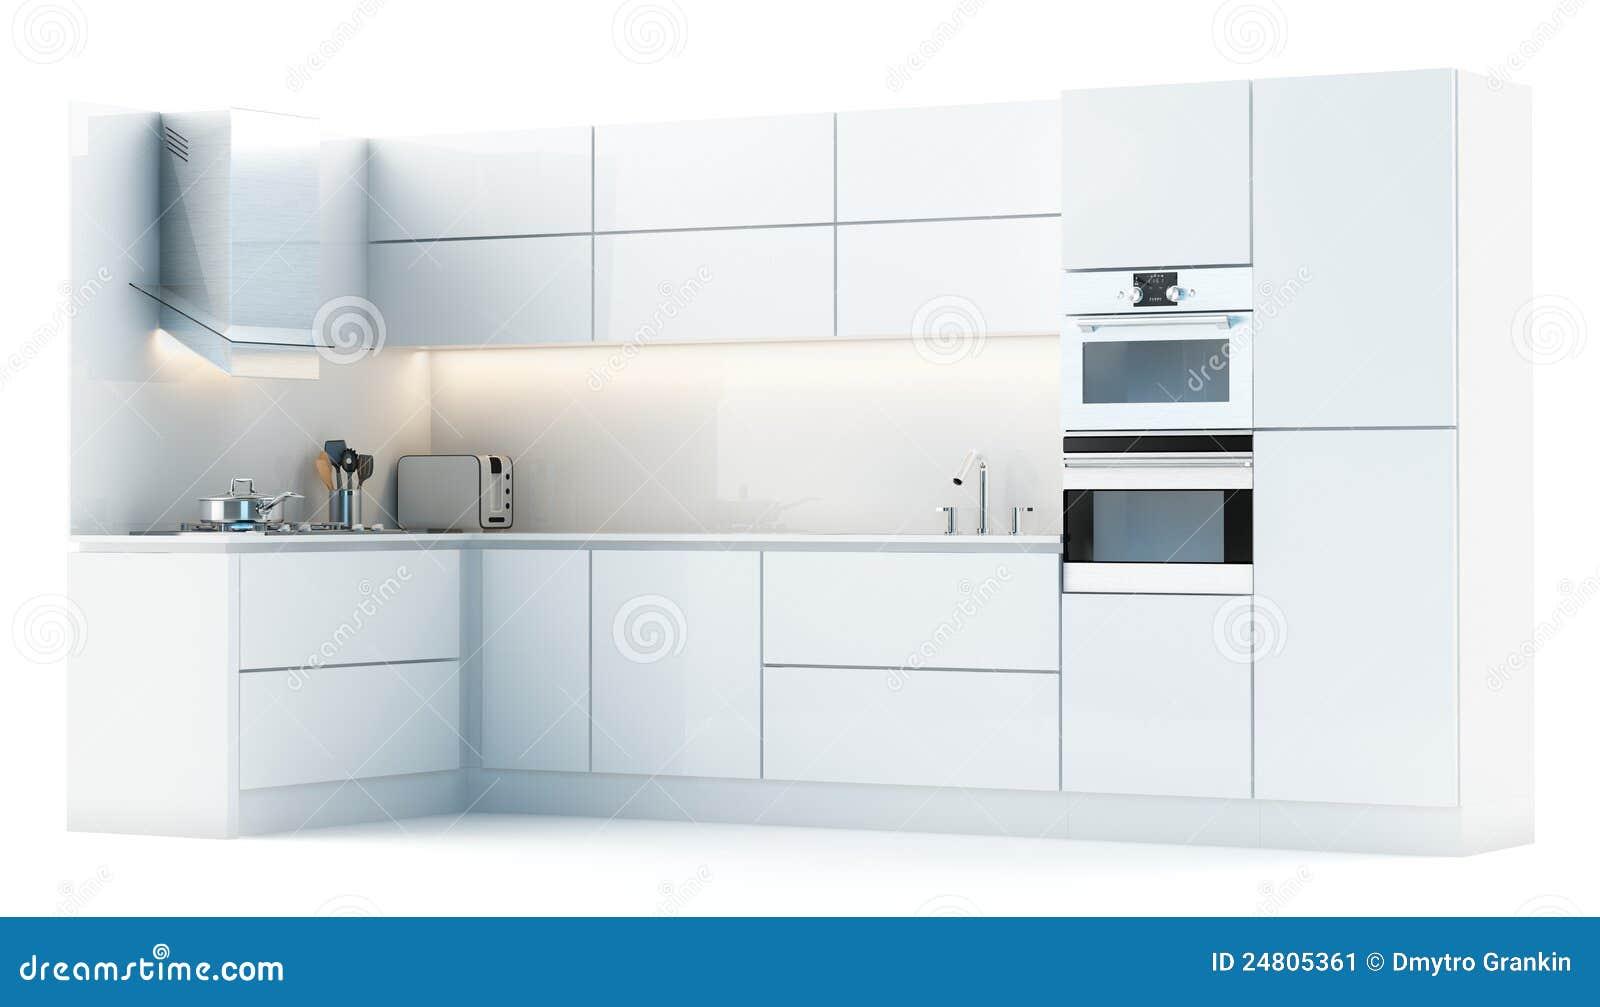 Studio Apartment Kitchen Cabinets